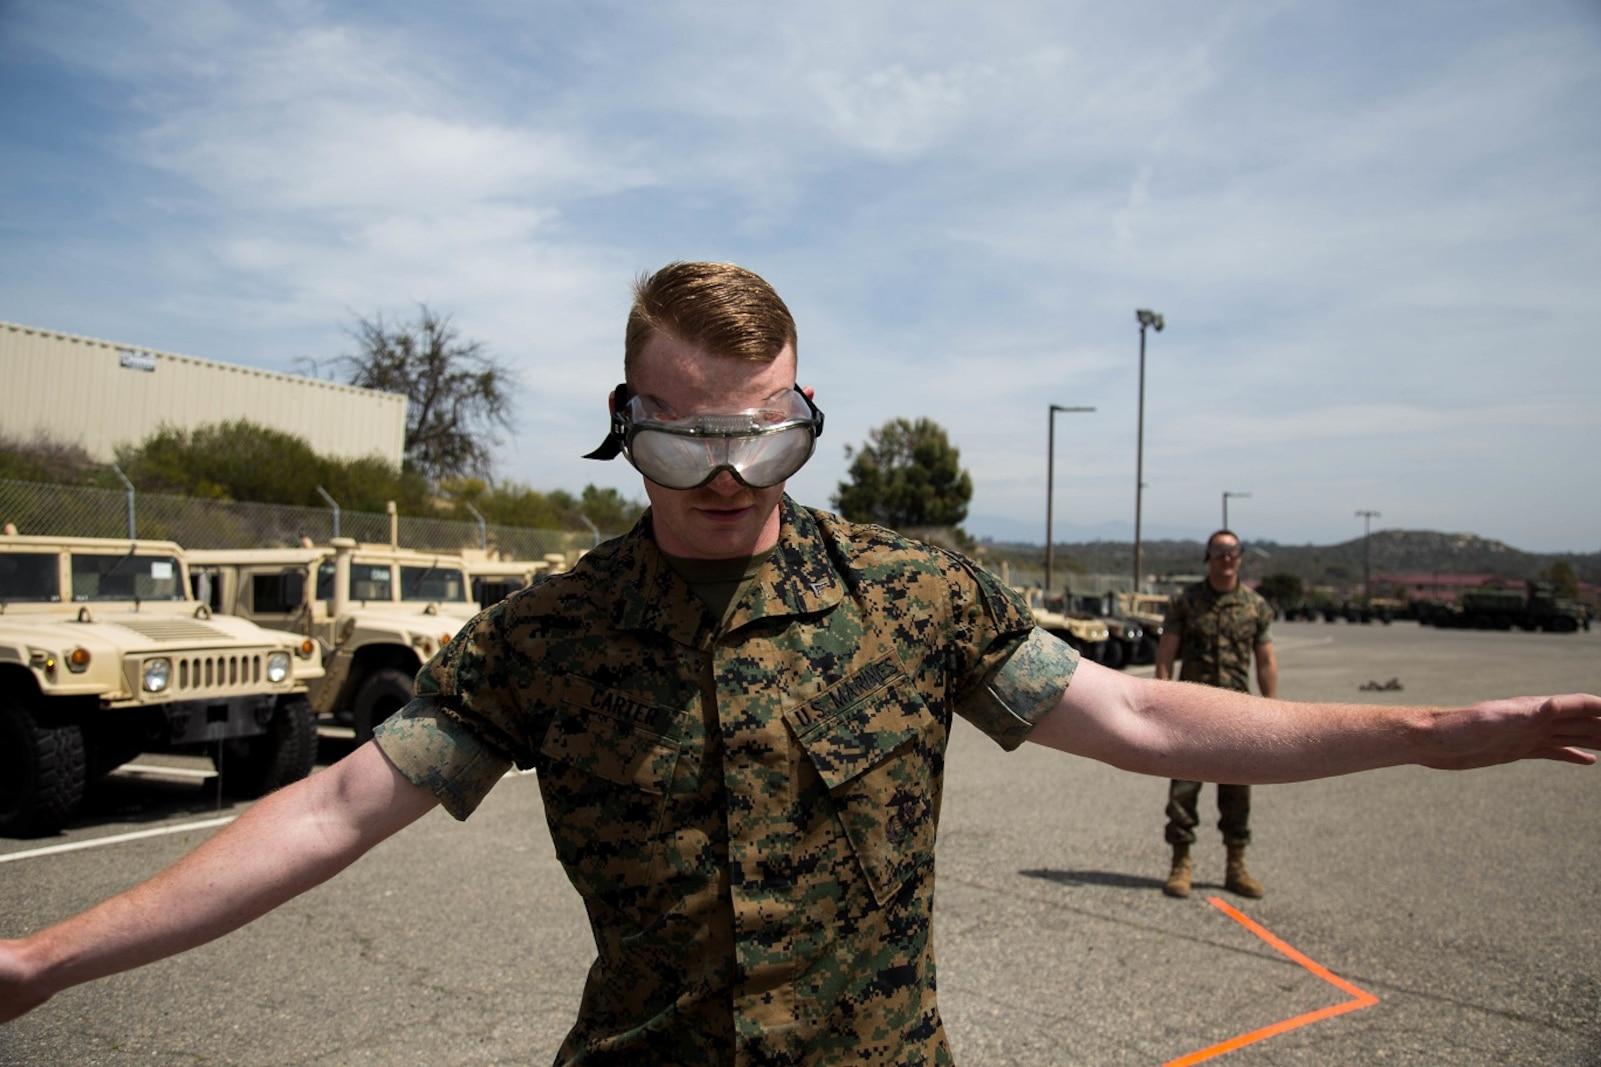 Combat Logistics Regiment 1 Participates in the Alcohol Free Weekend event